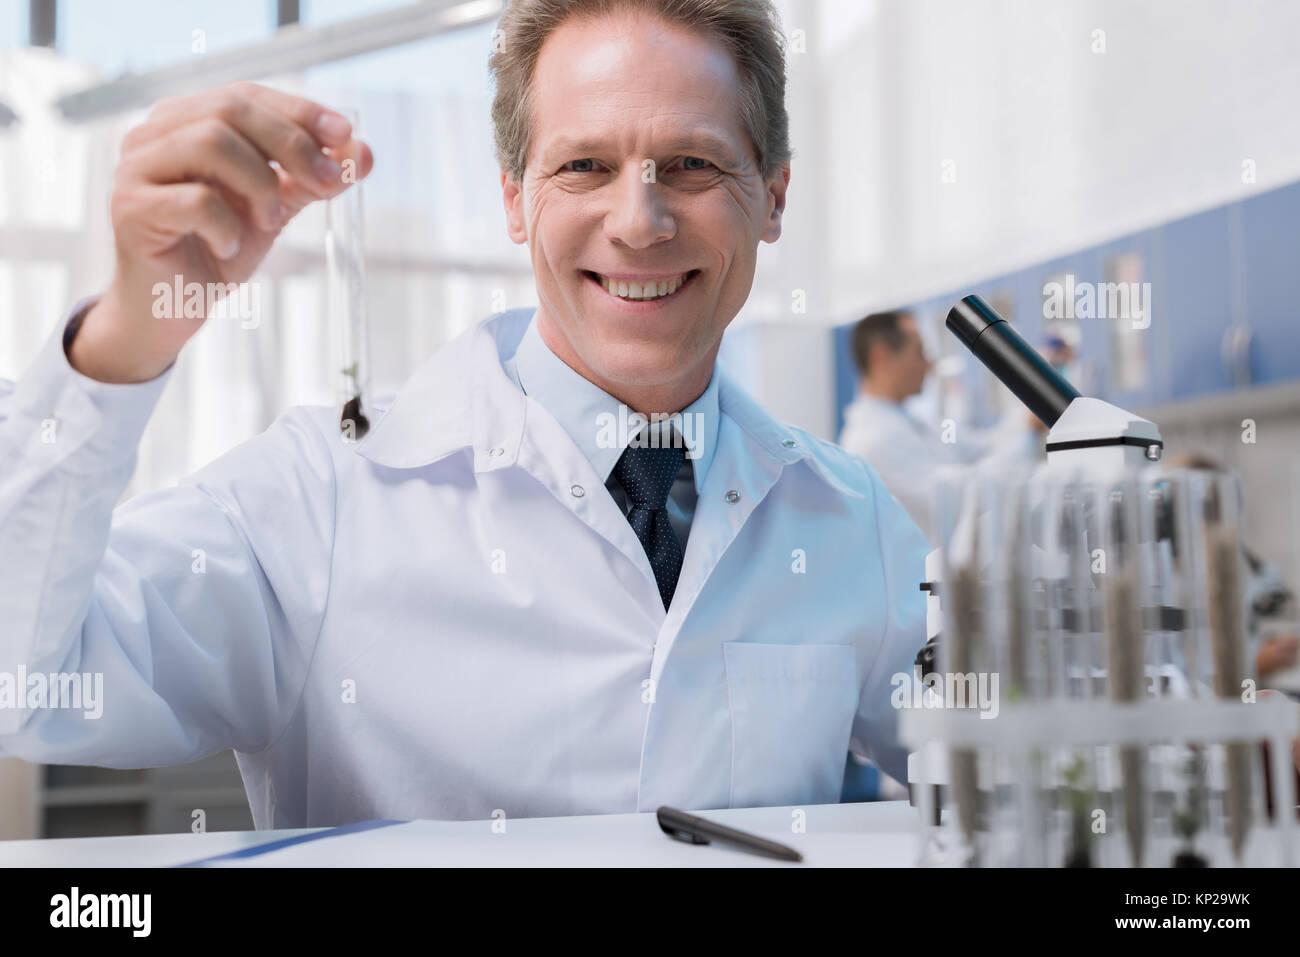 Smiling chemist holding test tube Photo Stock